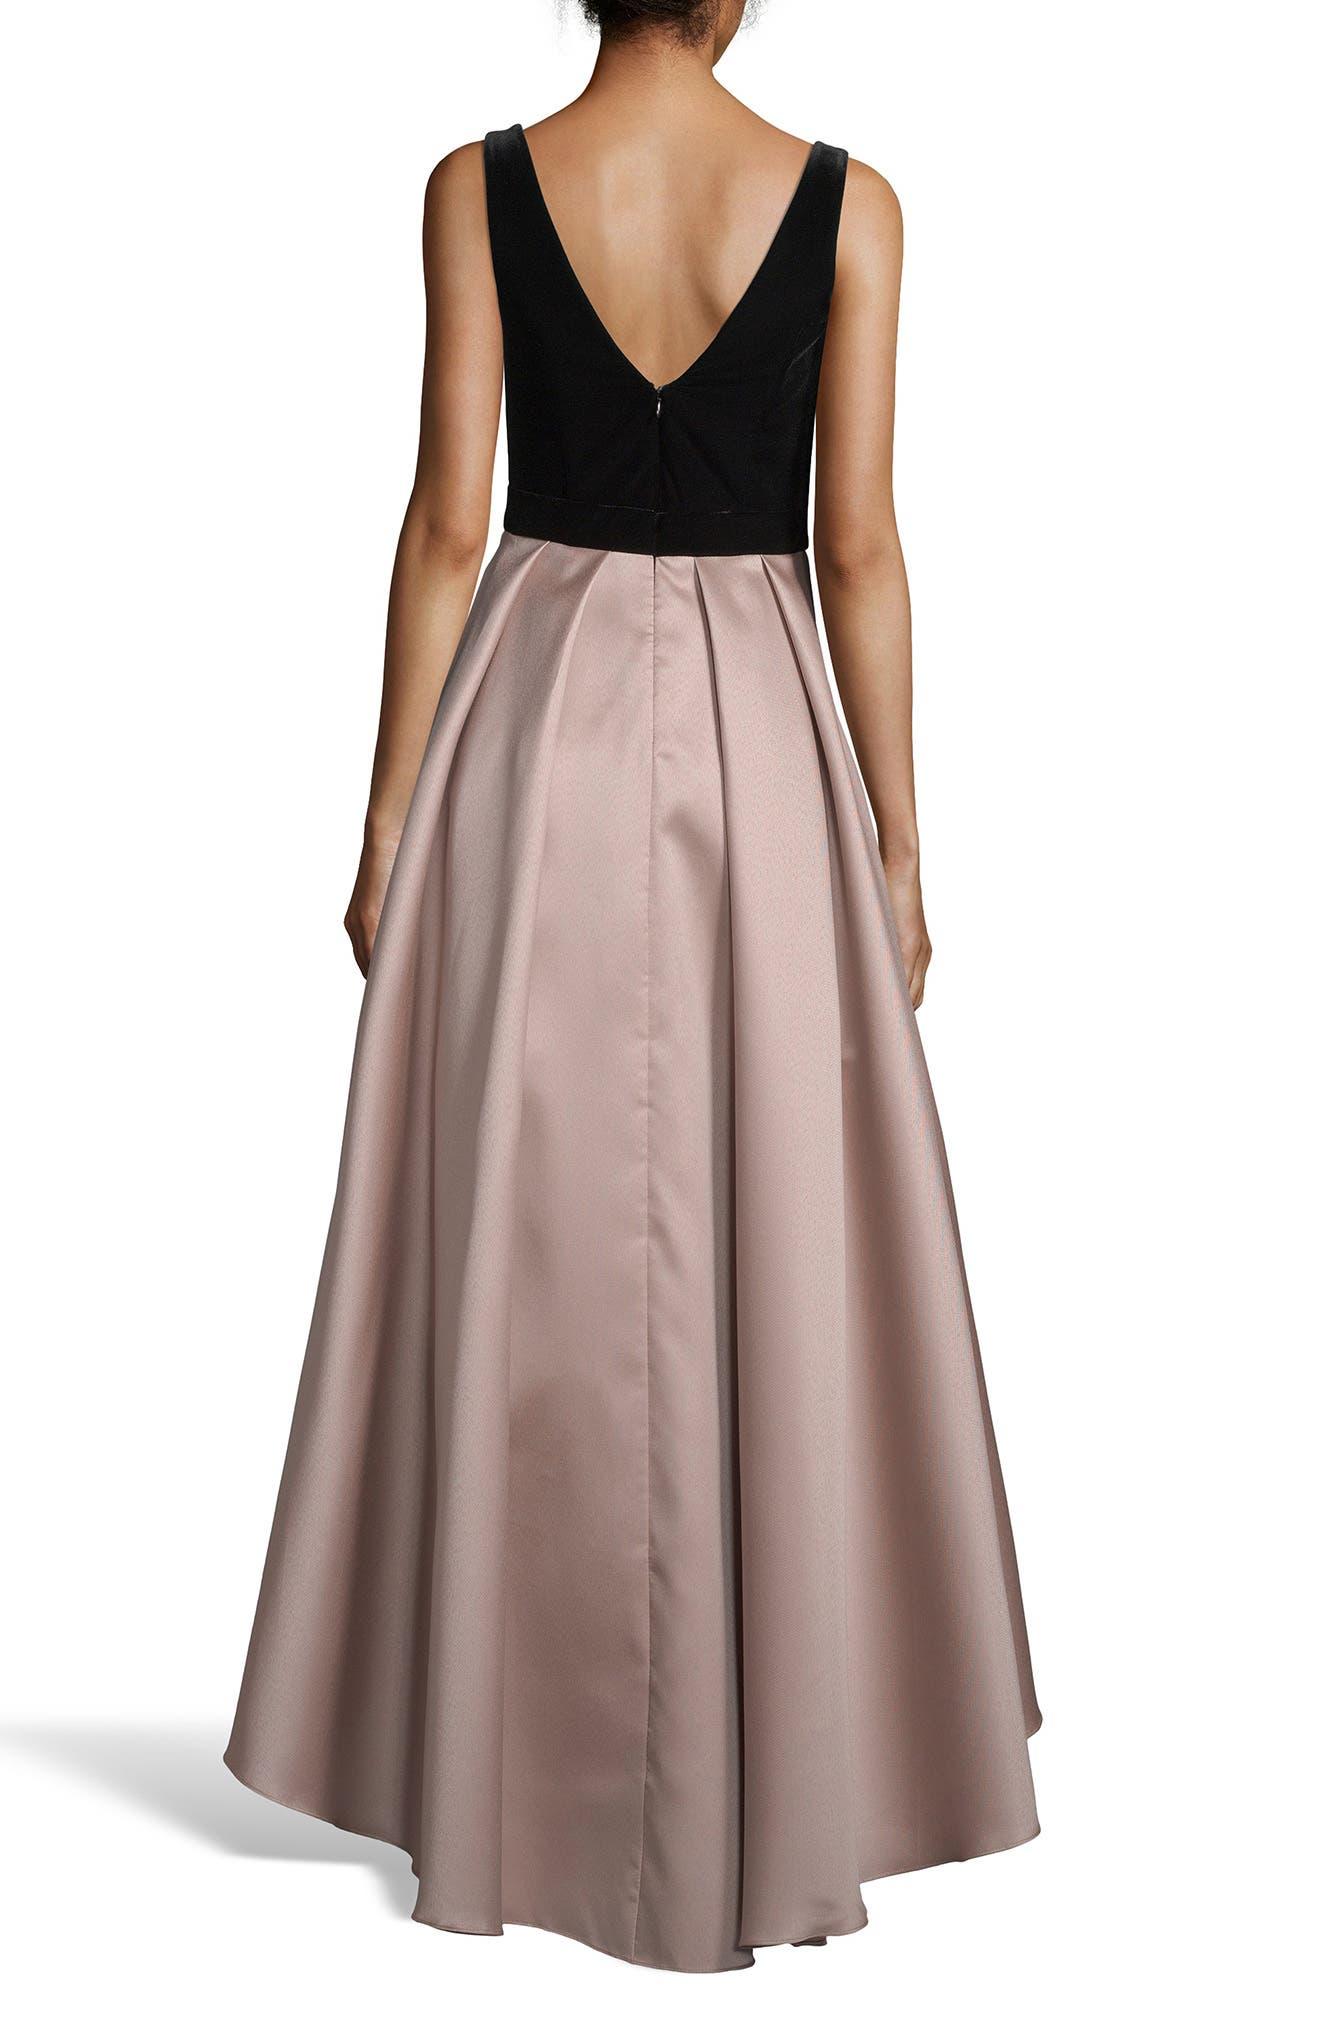 XSCAPE, Mikado Velvet Bodice Ball Gown, Alternate thumbnail 2, color, 250